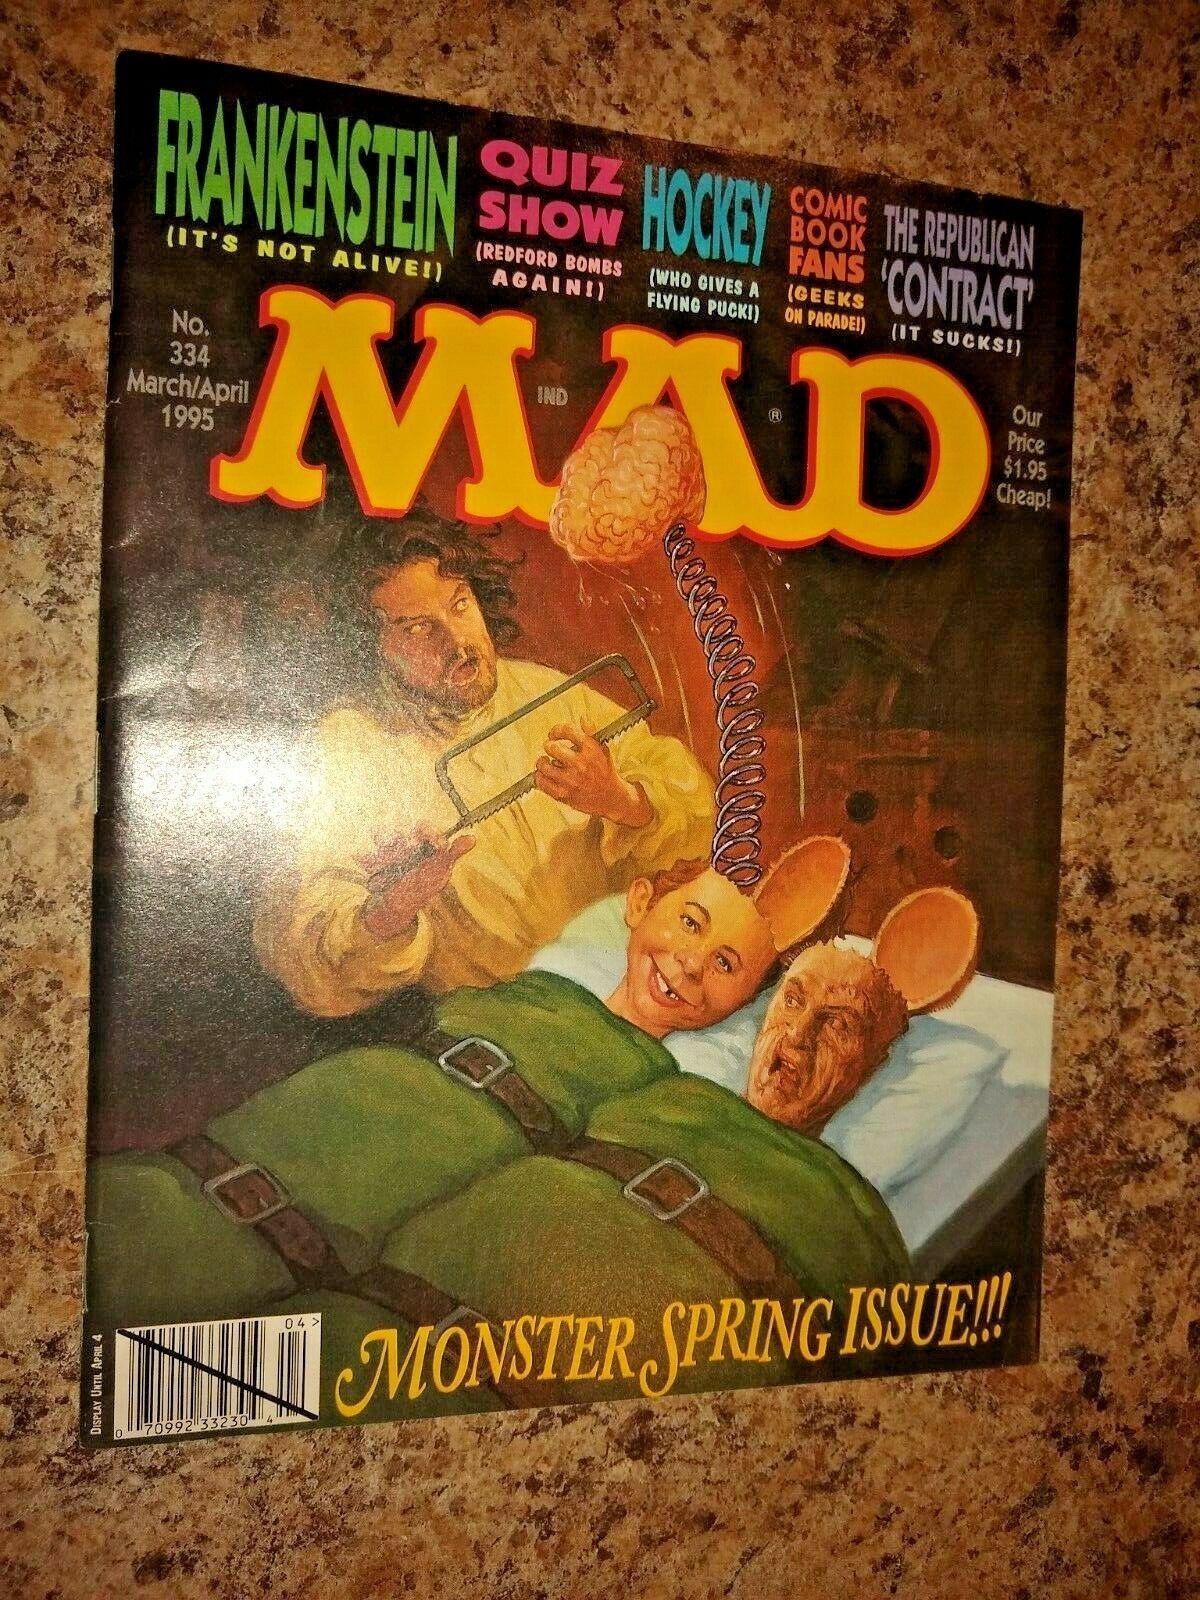 Mad Magazine #334 MARCH/APRIL 1995 - $2.49